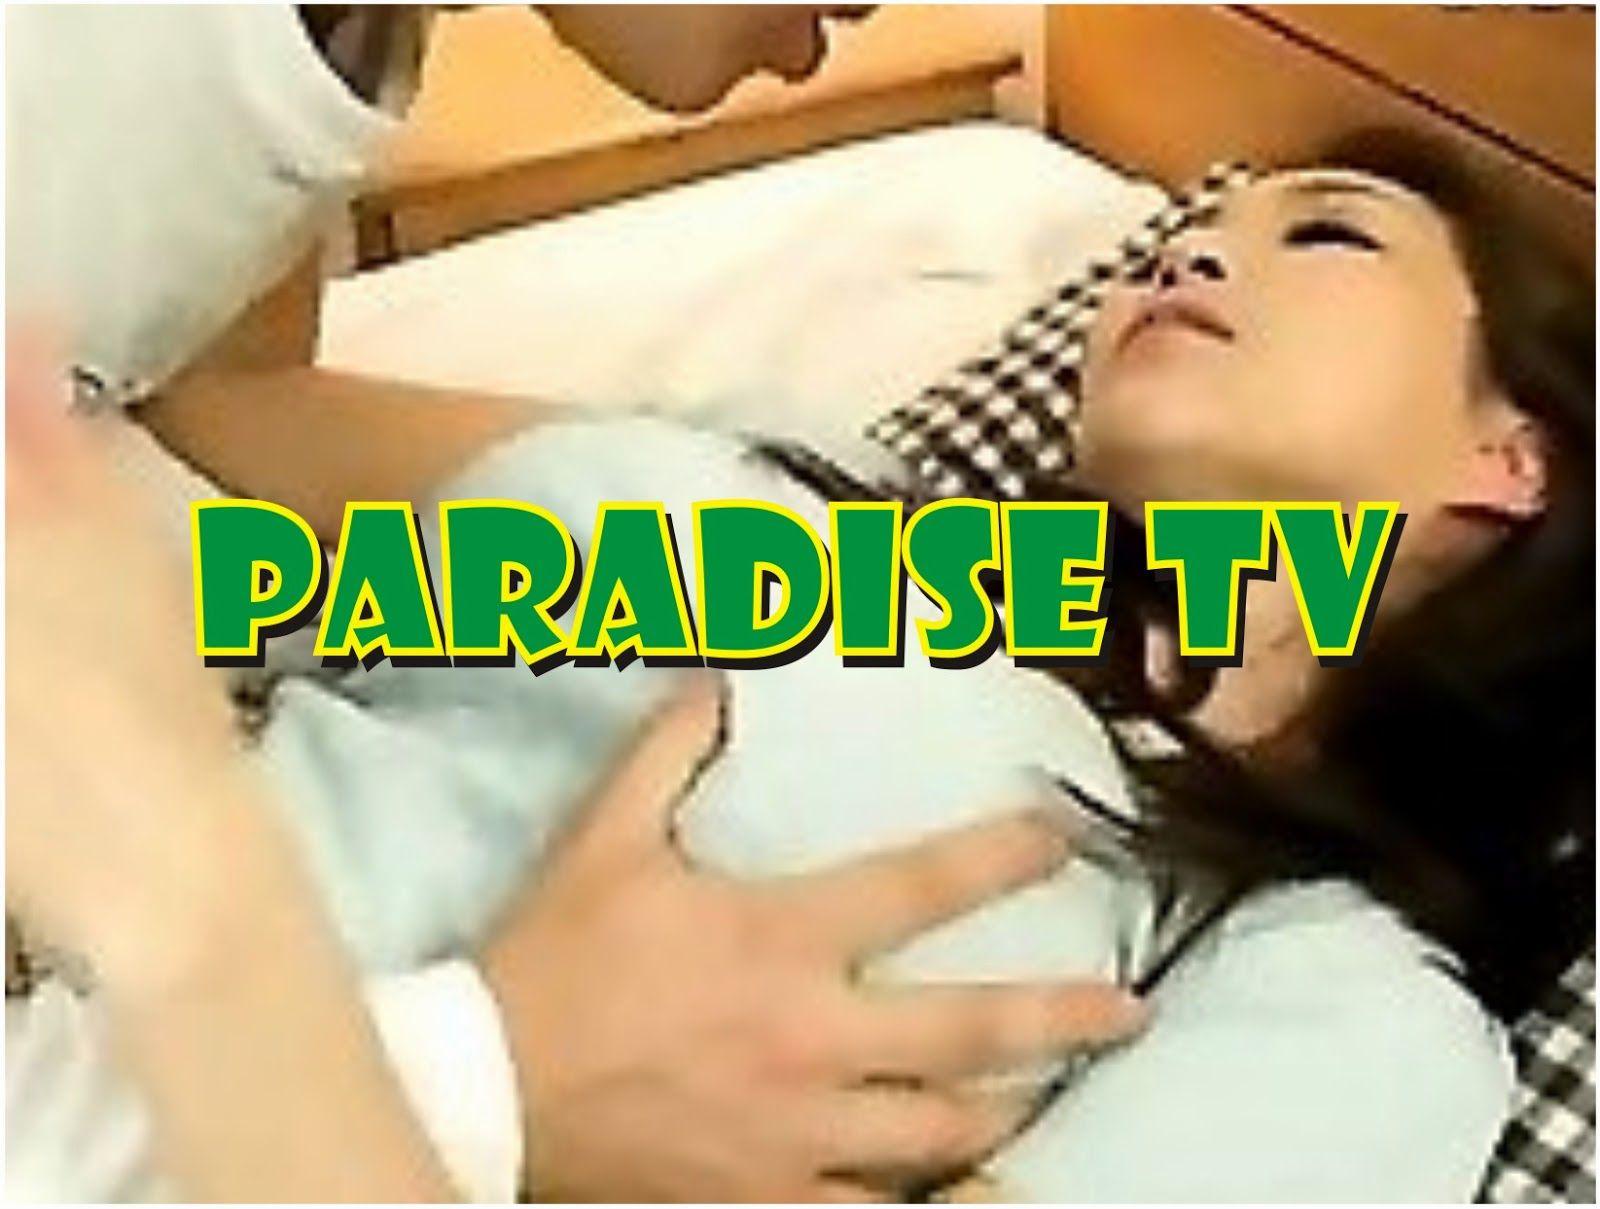 PARADISE TV Korea 18+ Live Streaming Online